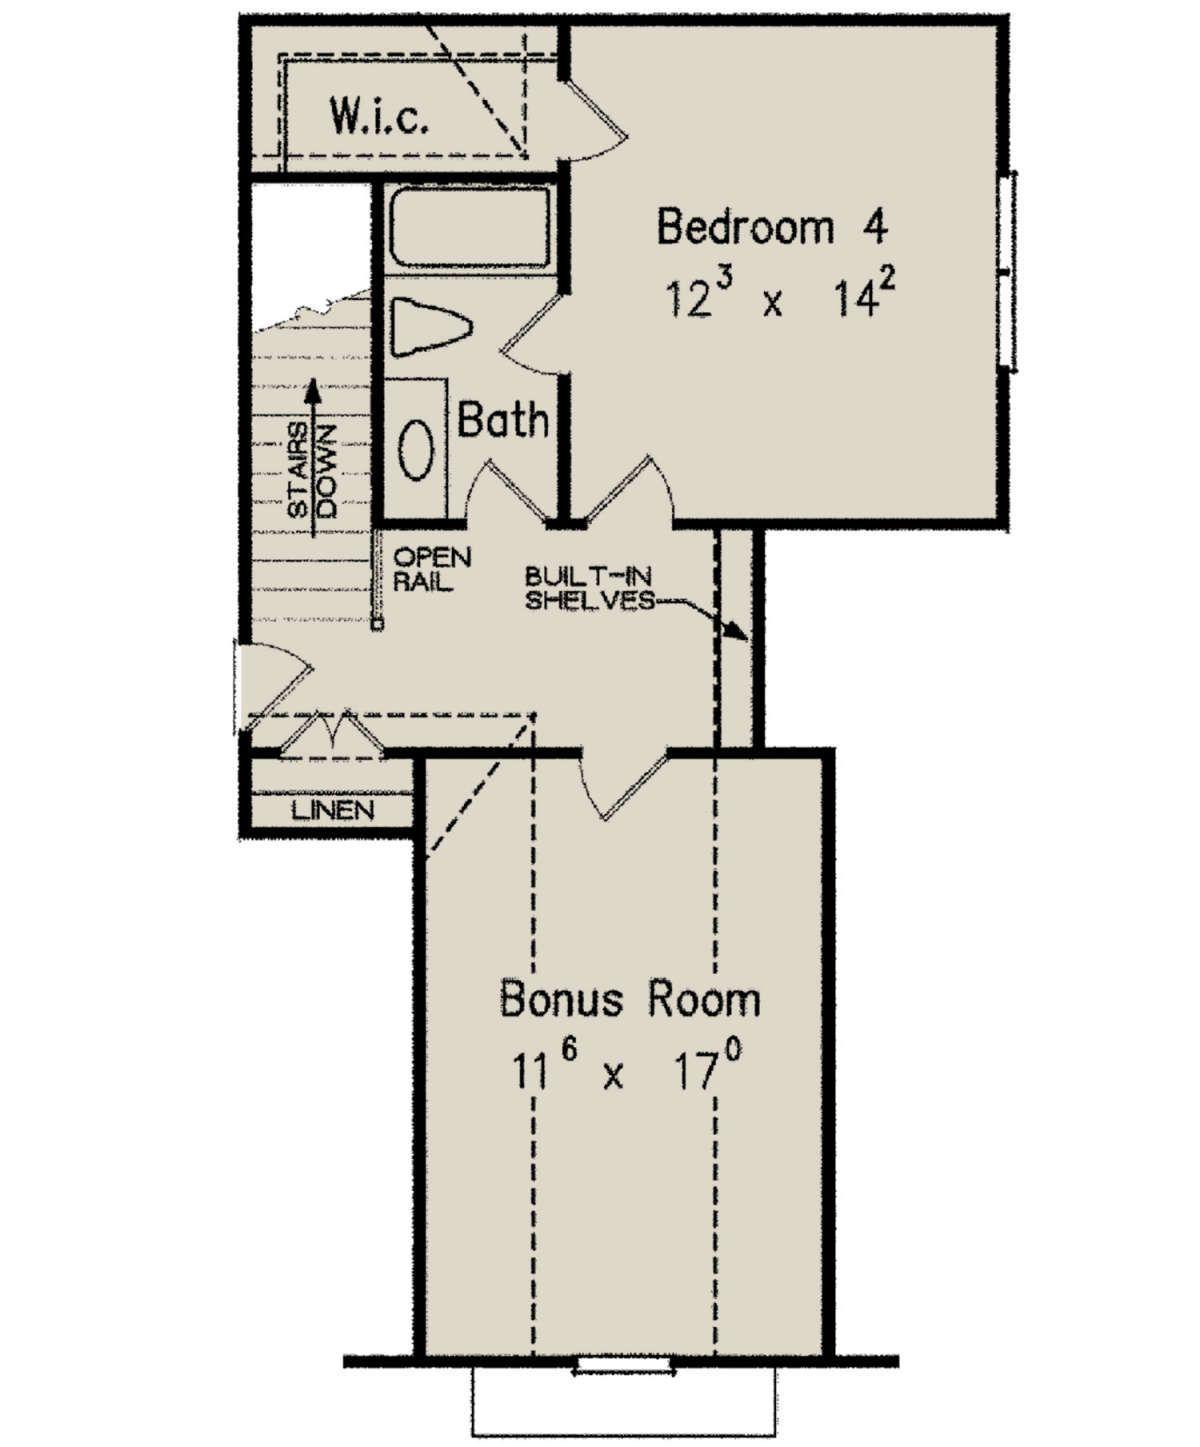 House Plan 8594 00247 European Plan 2 302 Square Feet 3 Bedrooms 2 5 Bathrooms European Plan How To Plan House Plans